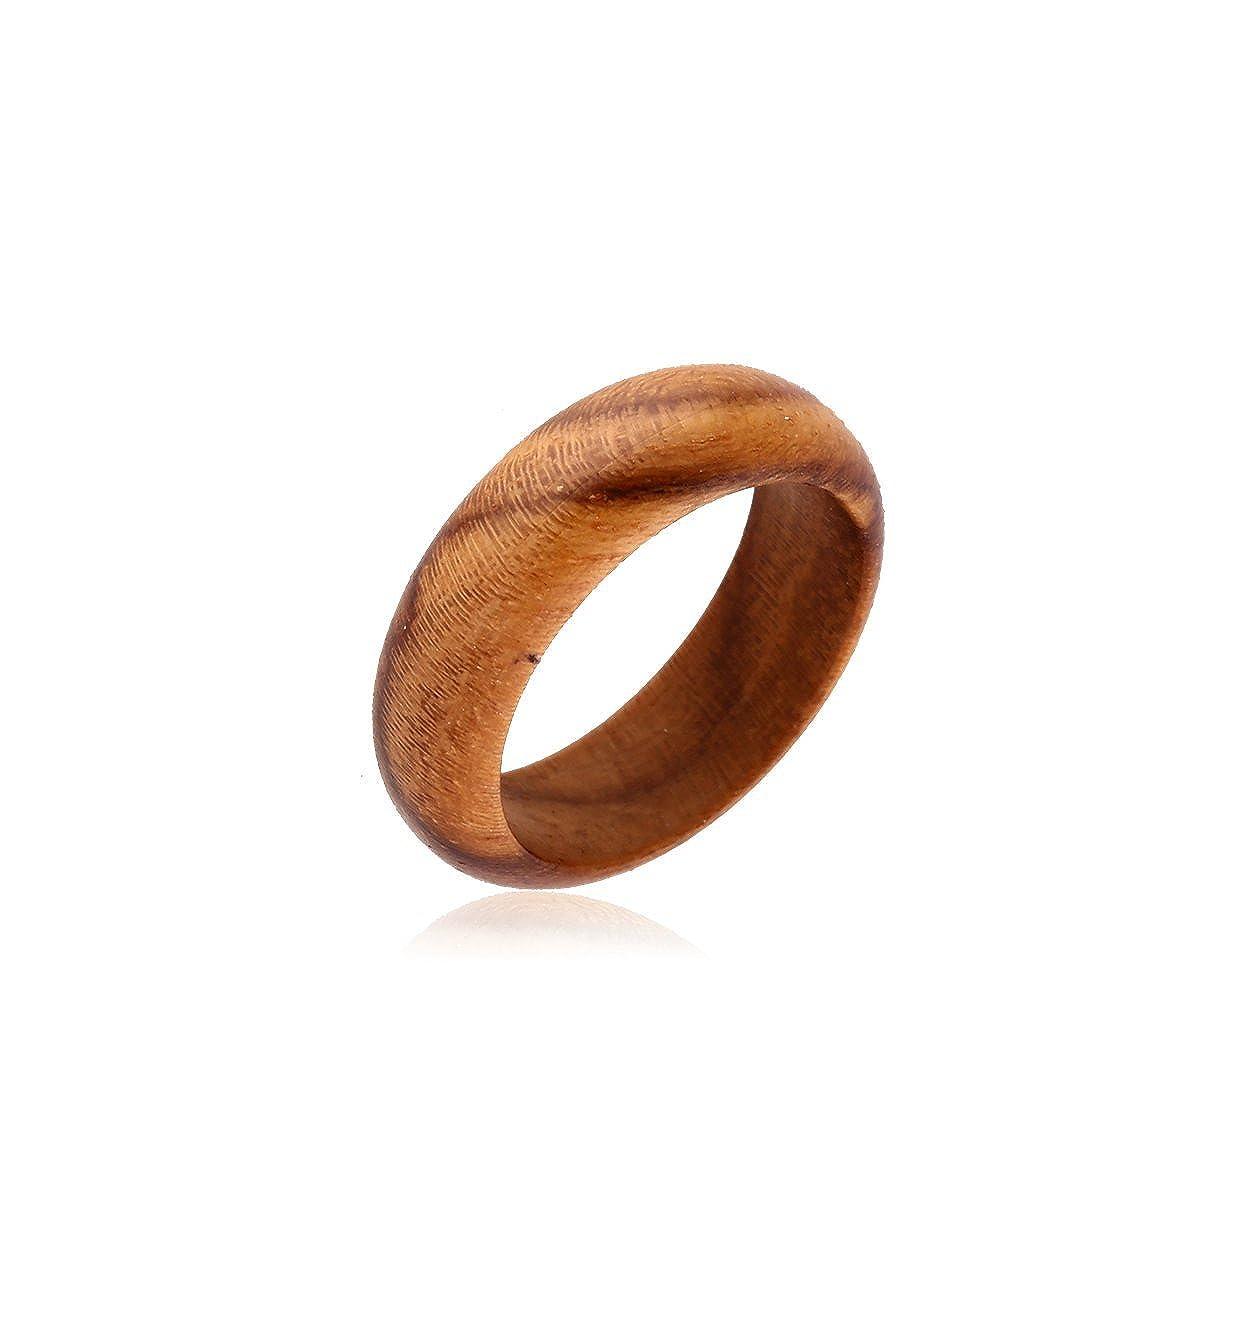 Qbubble Bubble Plain Wood Ring-Teak Wood Round Fashion Rings 200-WKF218-27AA